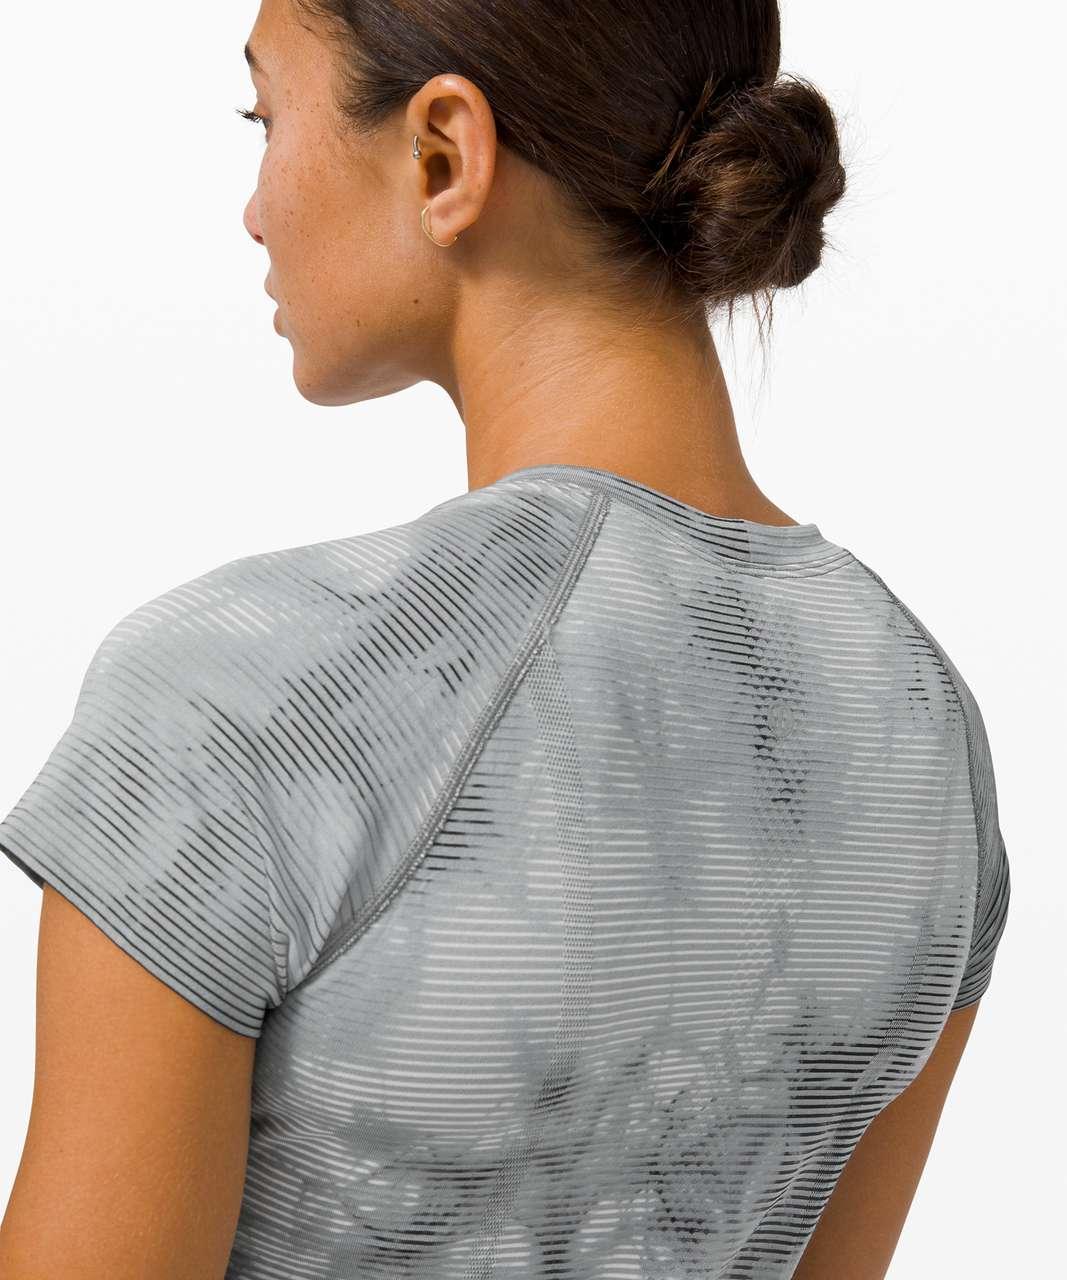 Lululemon Swiftly Tech Short Sleeve 2.0 *Shibori - Shibori Stripe Graphite Grey